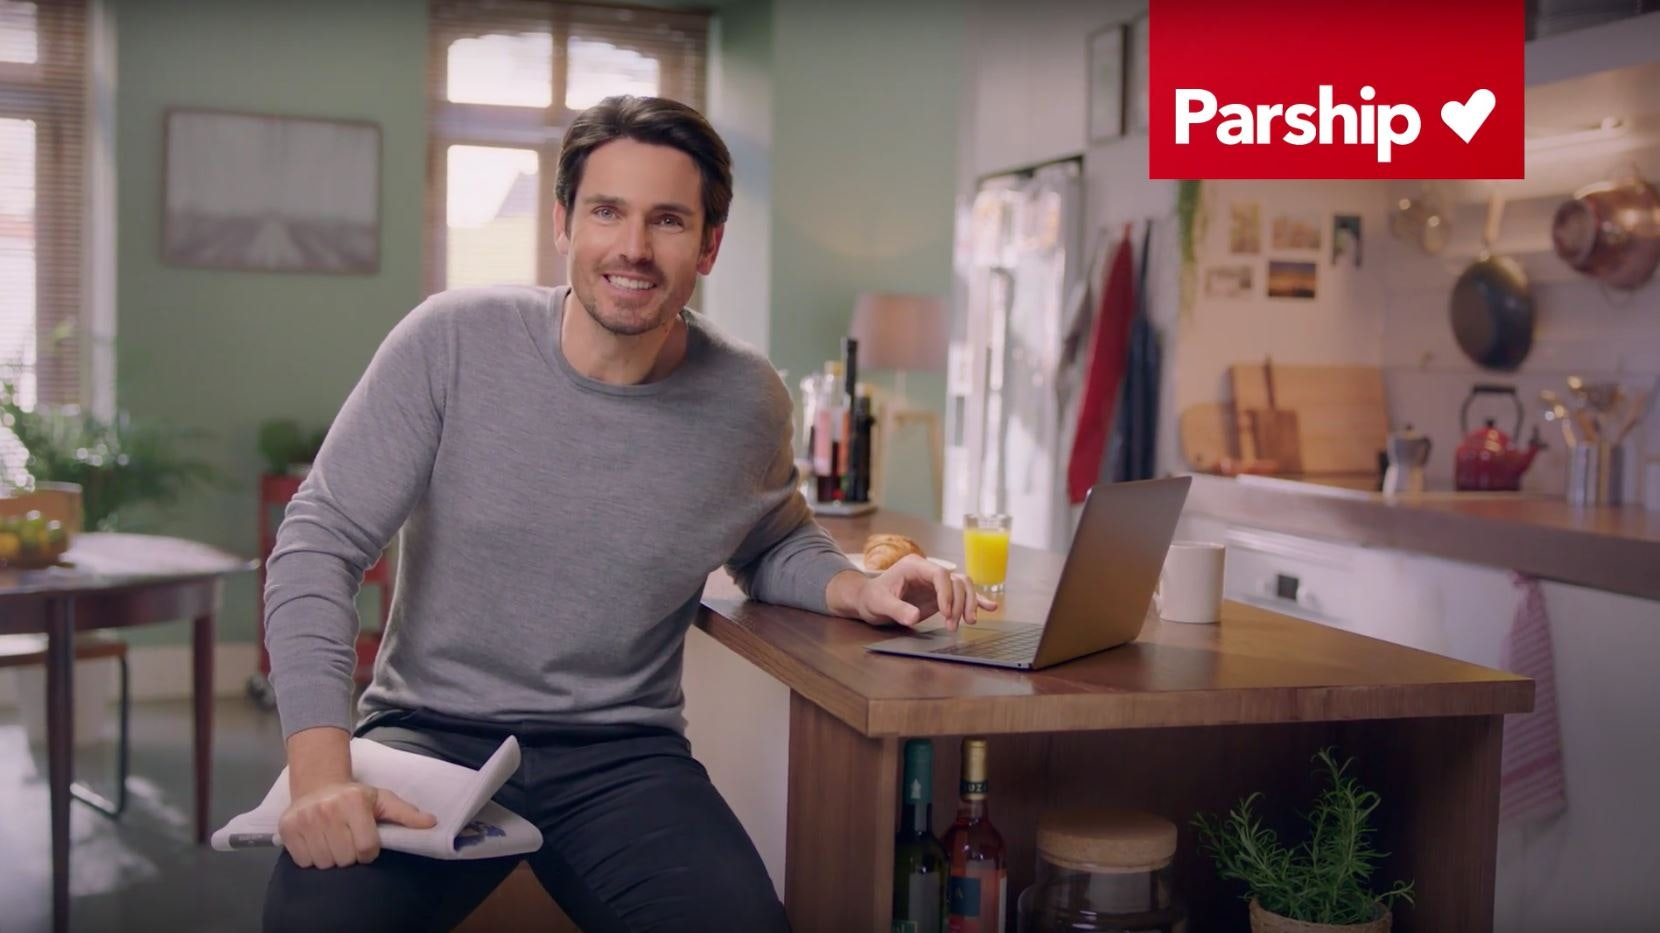 Parship werbung aus frau Psychologie partnerwahl: